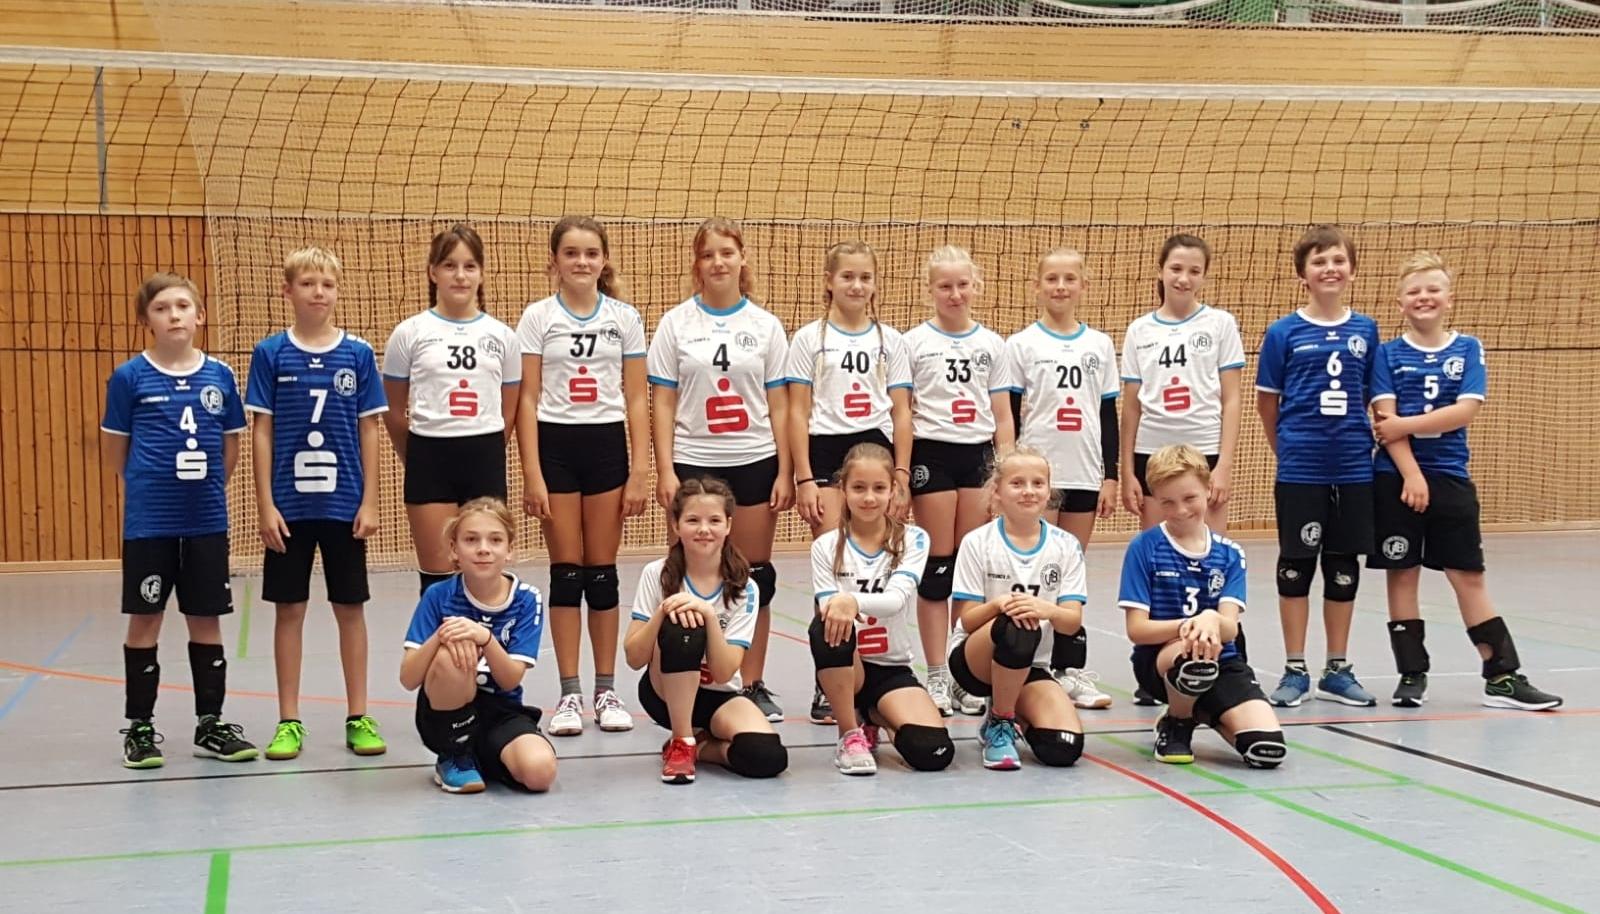 VfB 91 Suhl U13 (Team 2019/20)